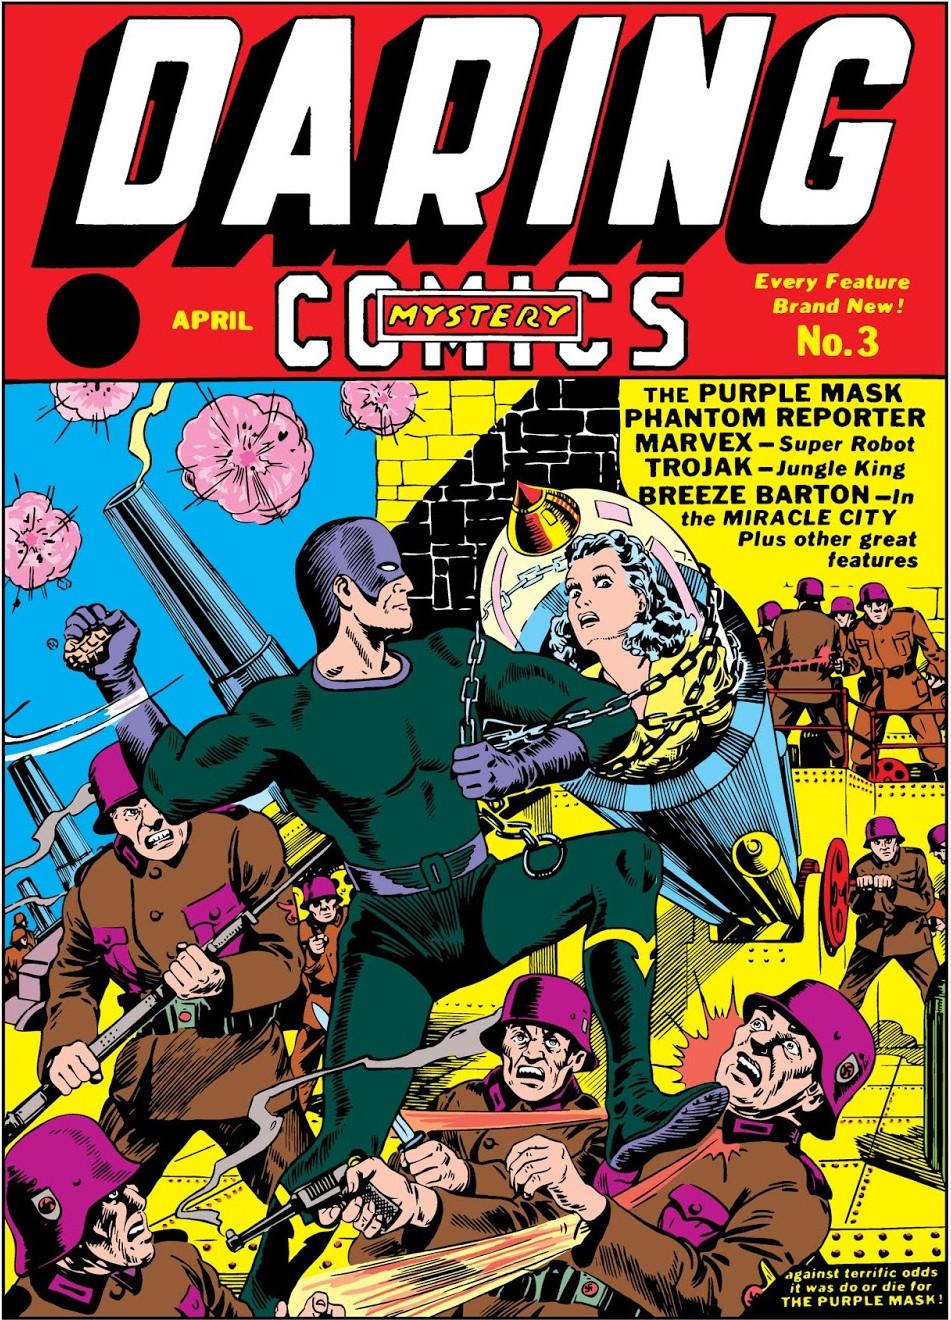 Daring Mystery Comics Vol 1 3.jpg